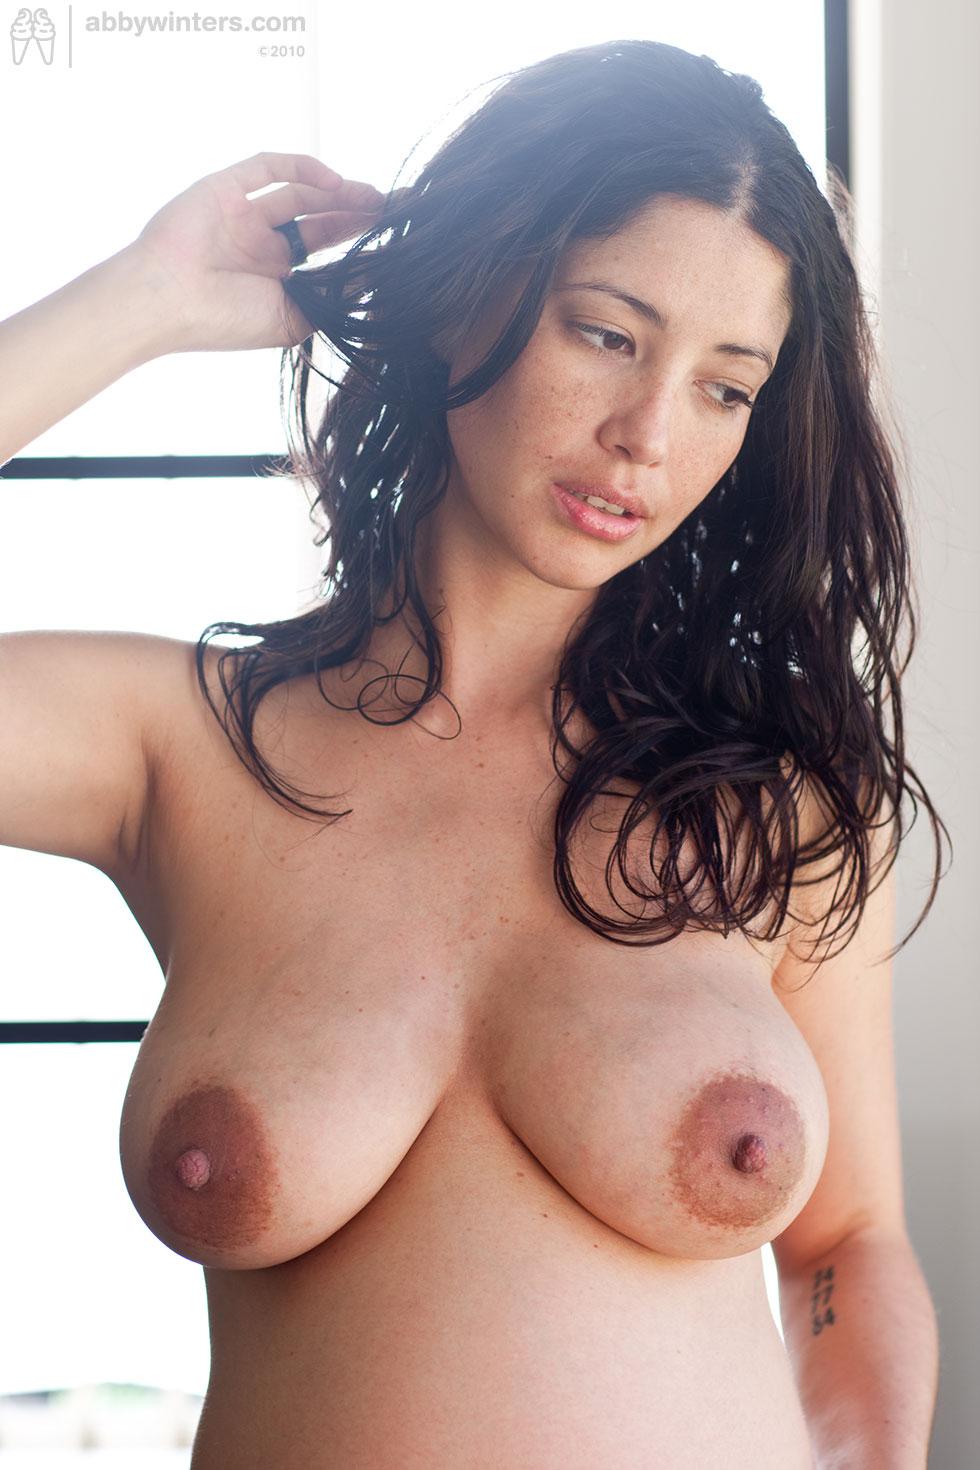 aw hannah12 big 1600×1200 bikini wallpapers of giada delaurentiis   News, Articles, ...